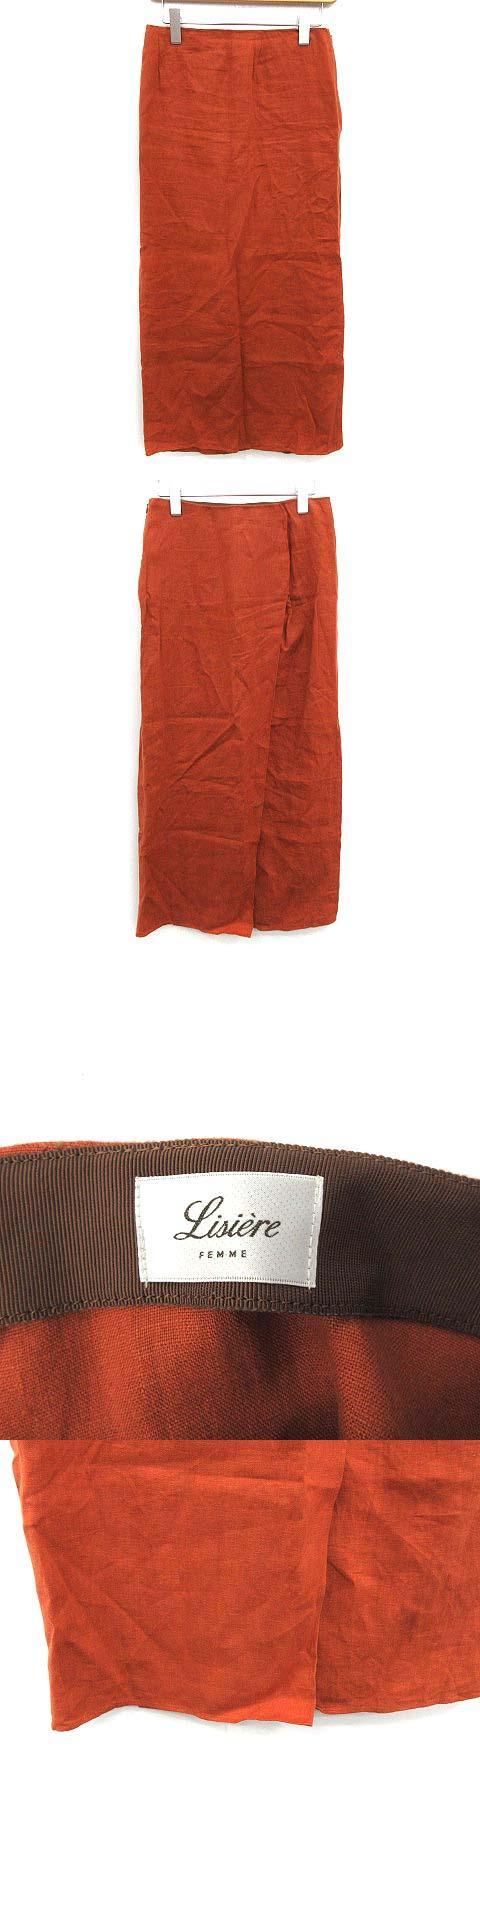 FEMME 18AW スカート ロング BACK SLIT LINEN LONG リネン 34 オレンジ /KH